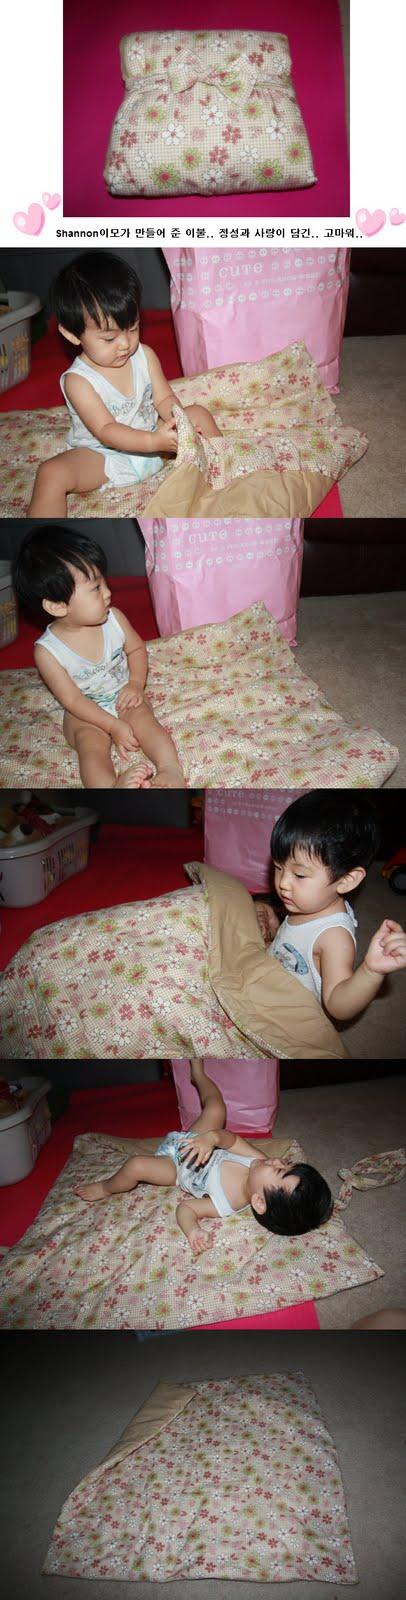 Daniel With Baby Futon